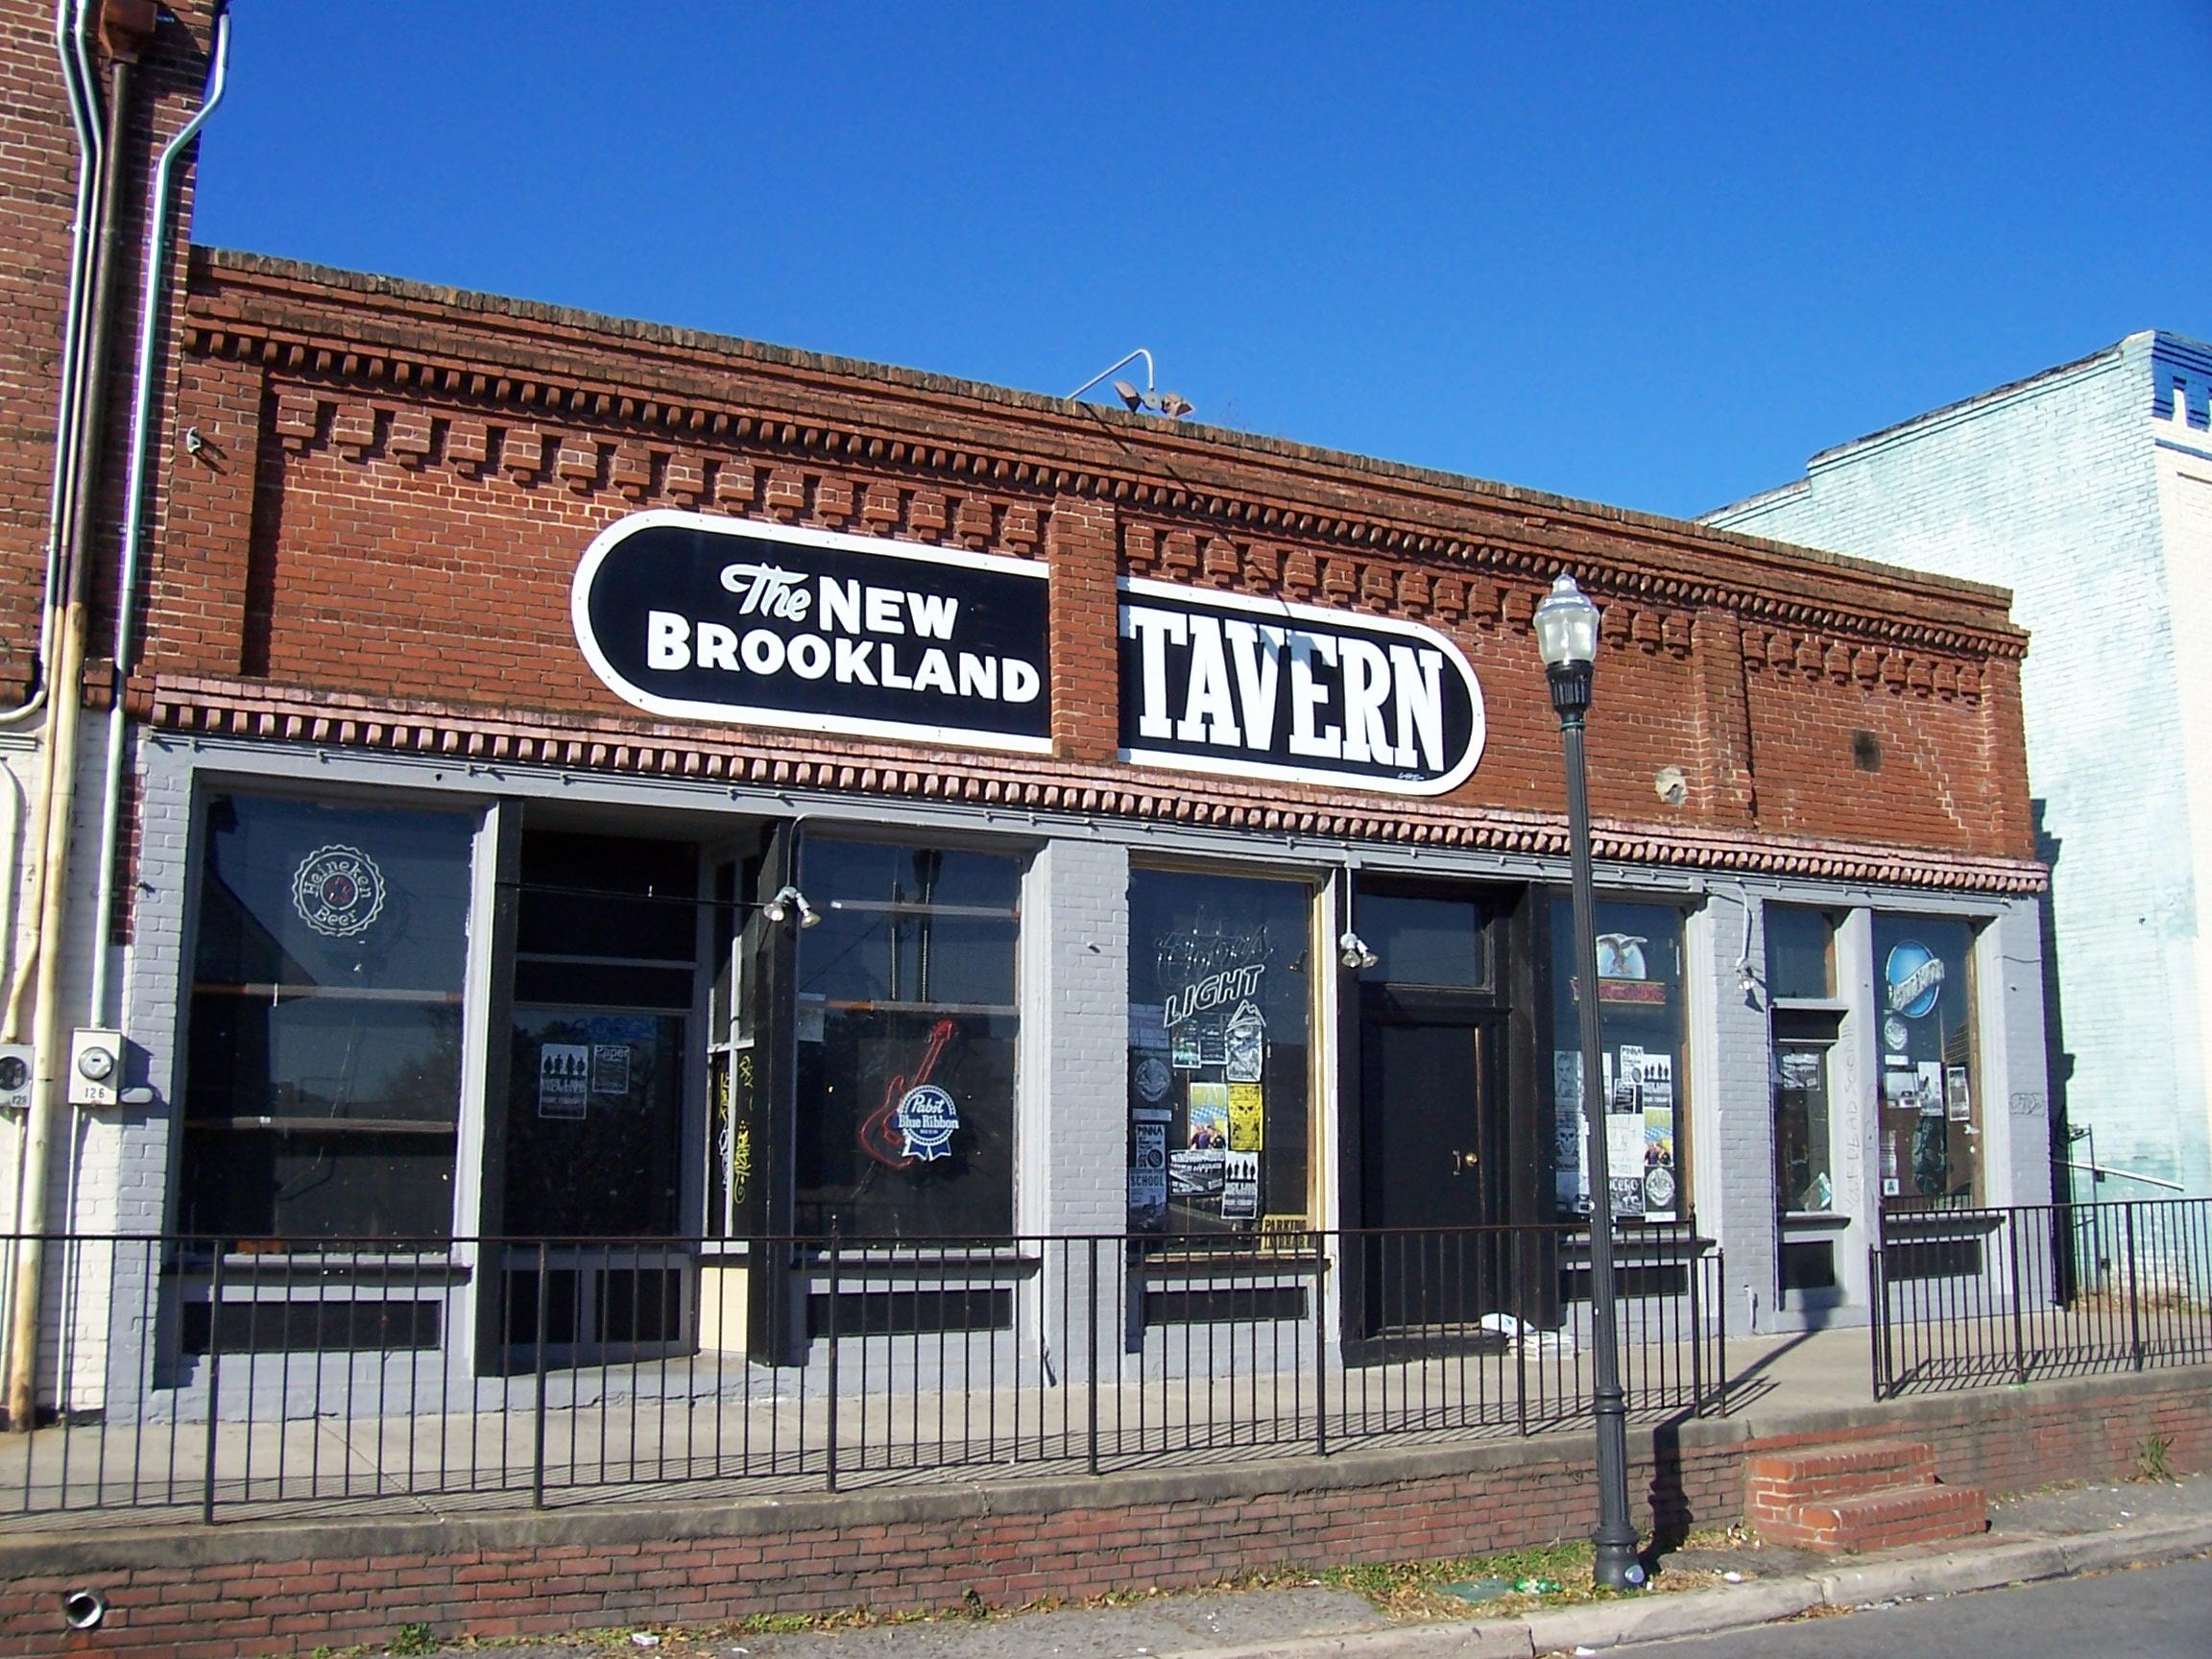 New Brookland Tavern